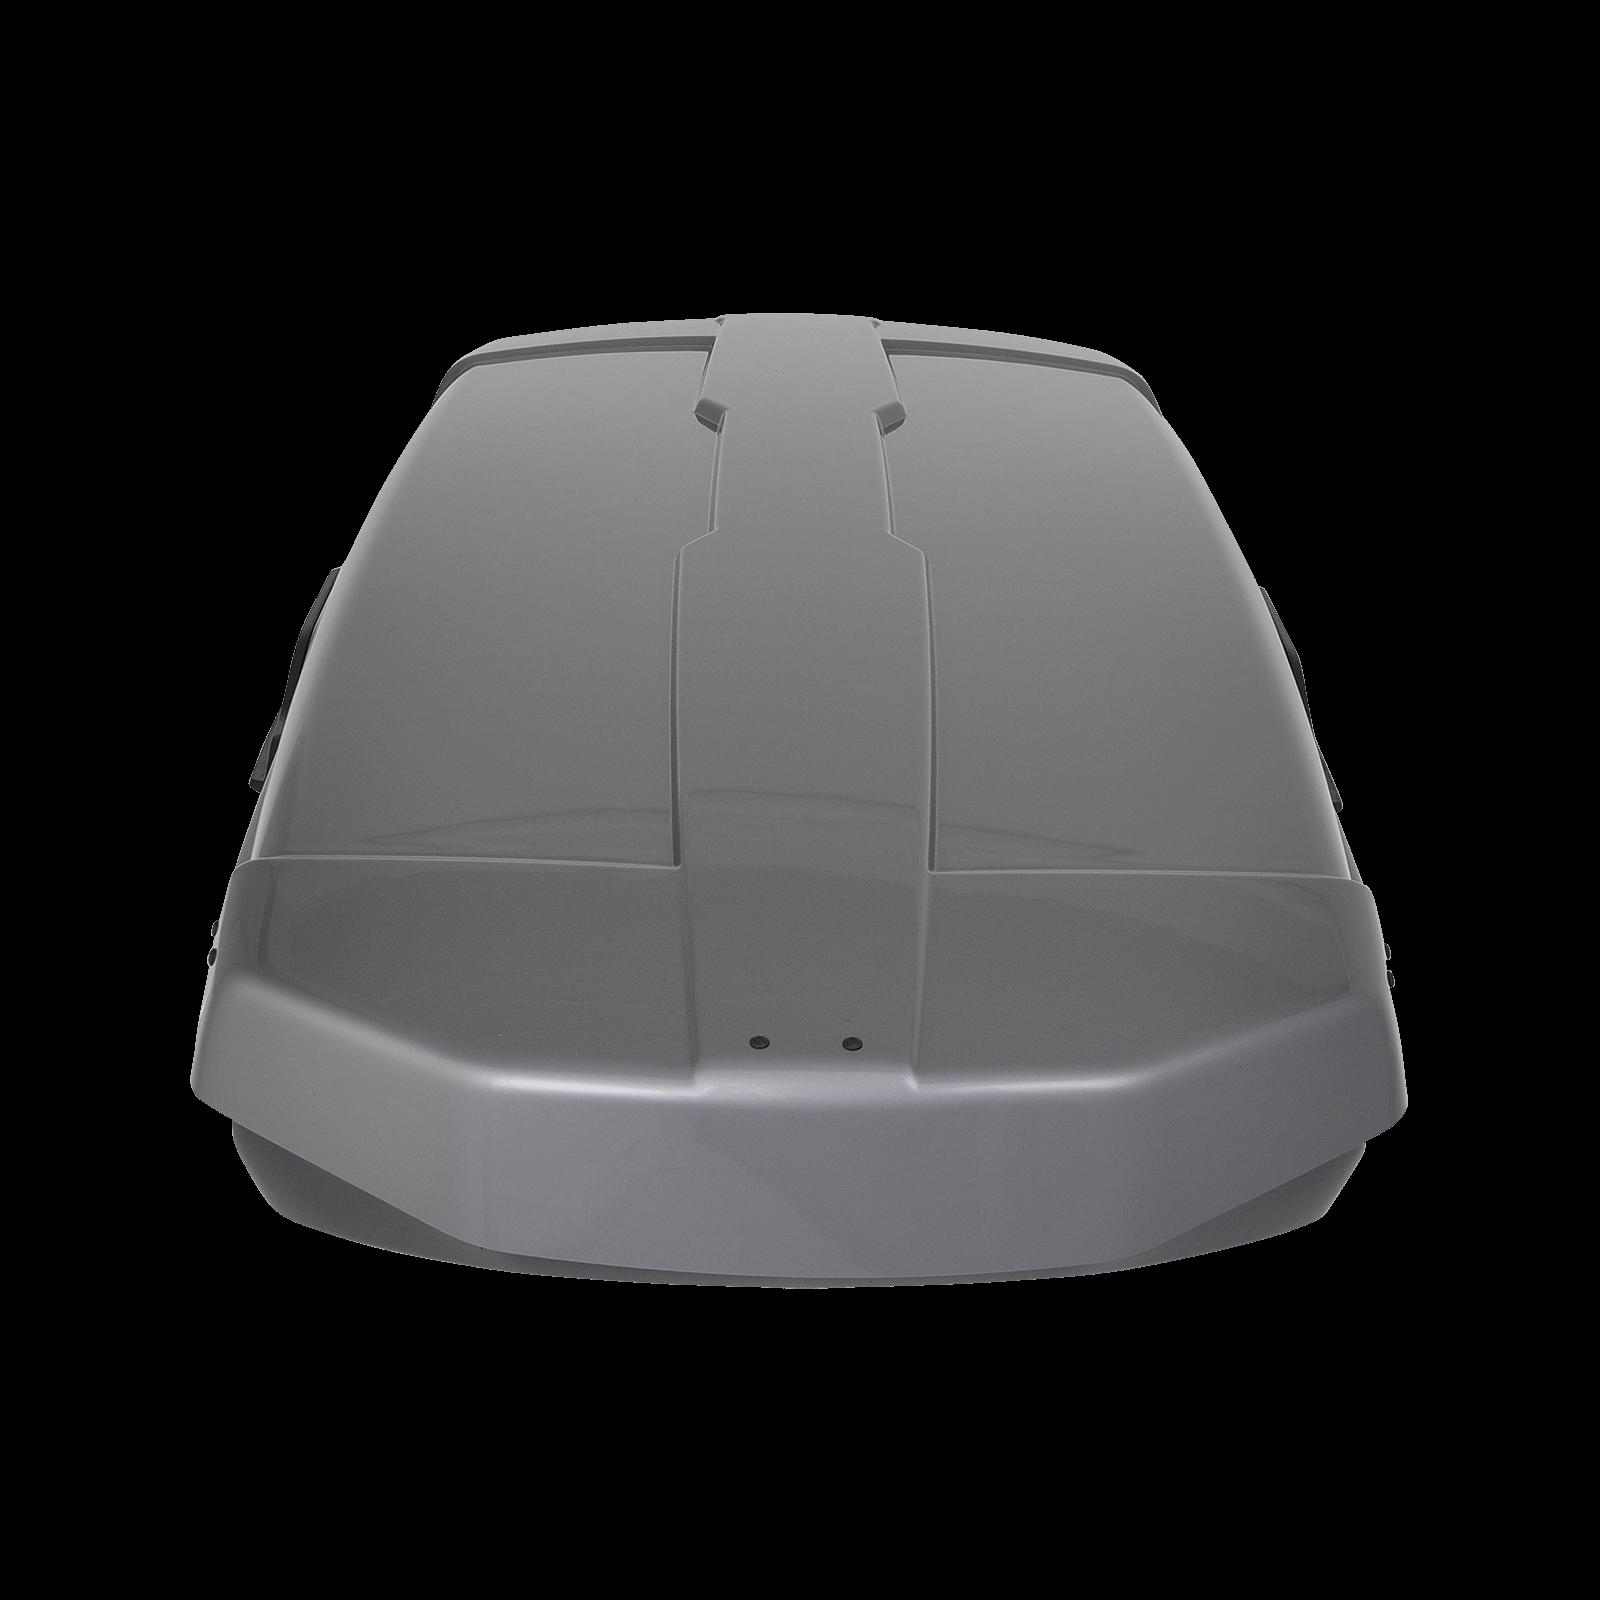 Dachbox Thule Motion XT Alpine Titan Glossy - Bild 3